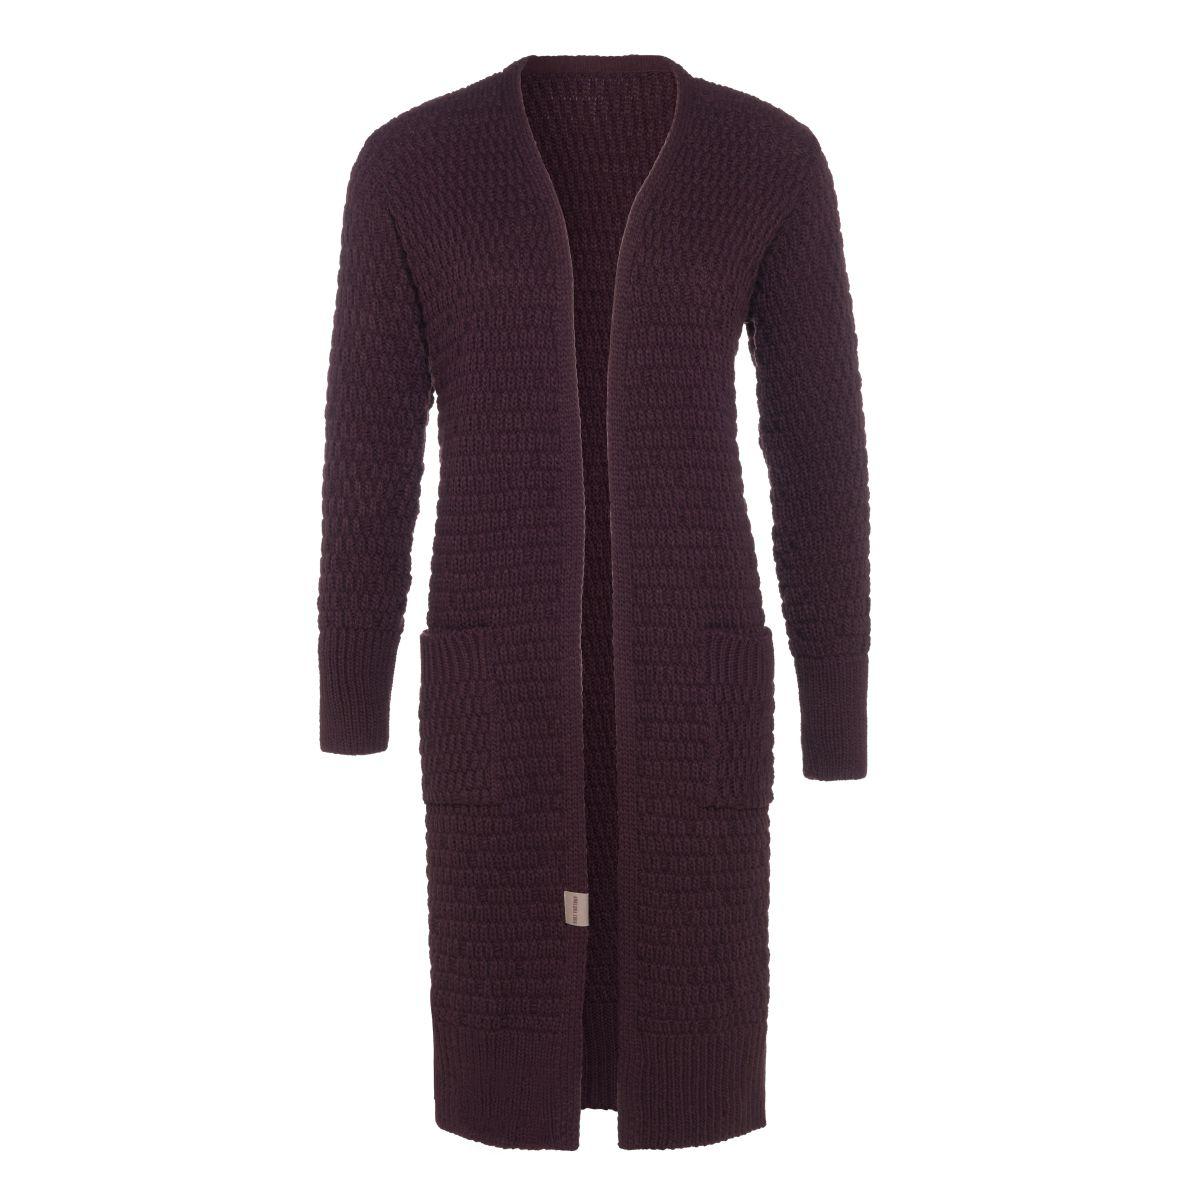 jaida long knitted cardigan aubergine 4042 with side pockets